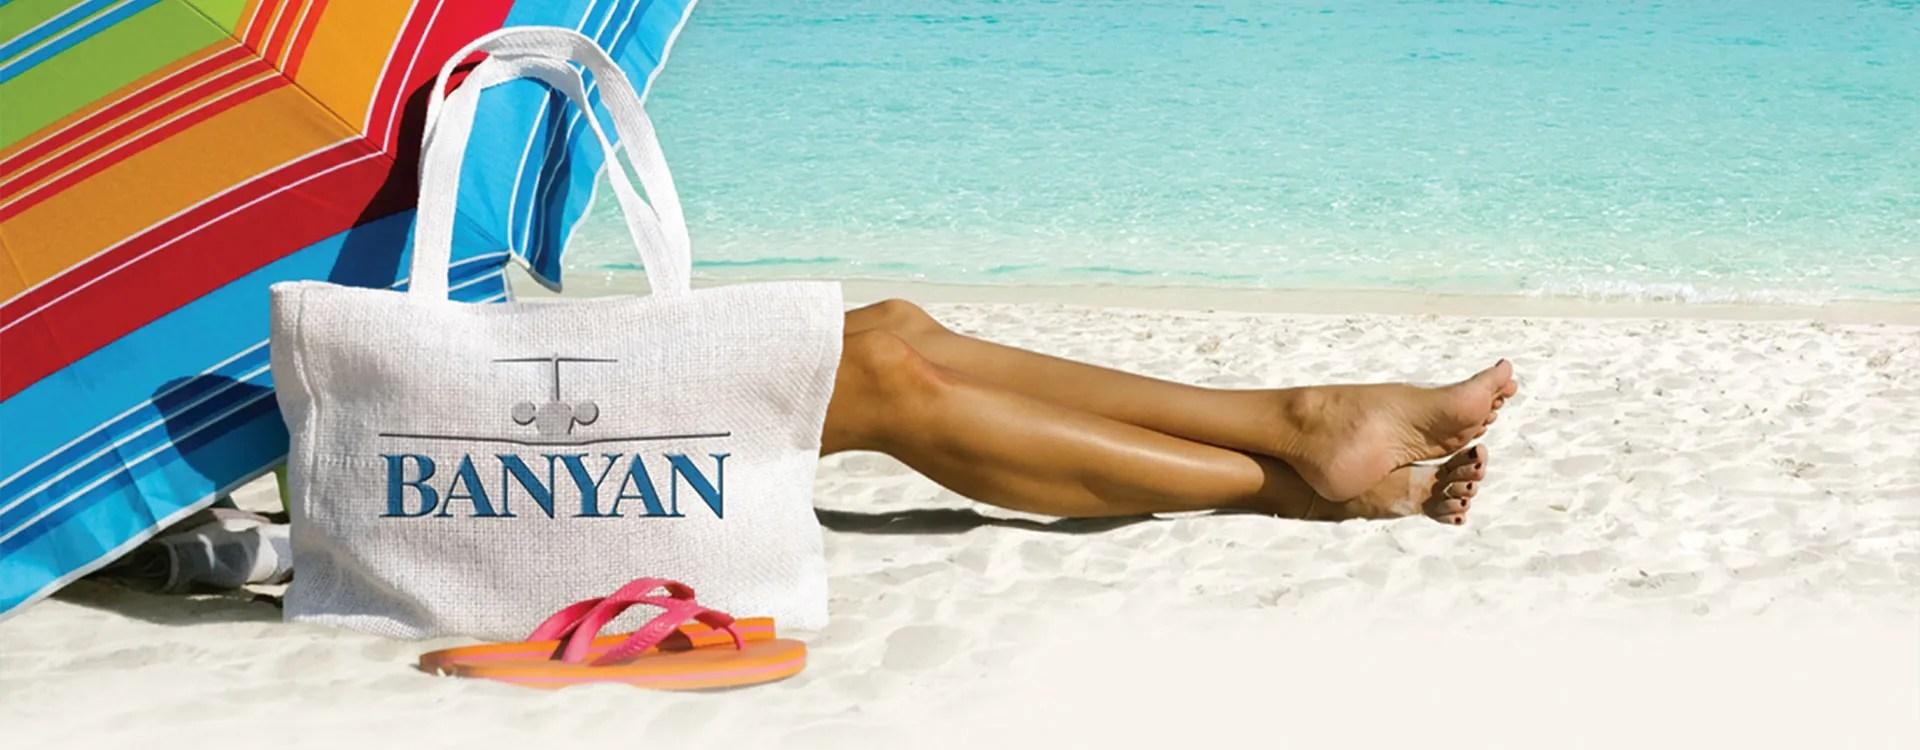 Banyan bag on bahamas beach